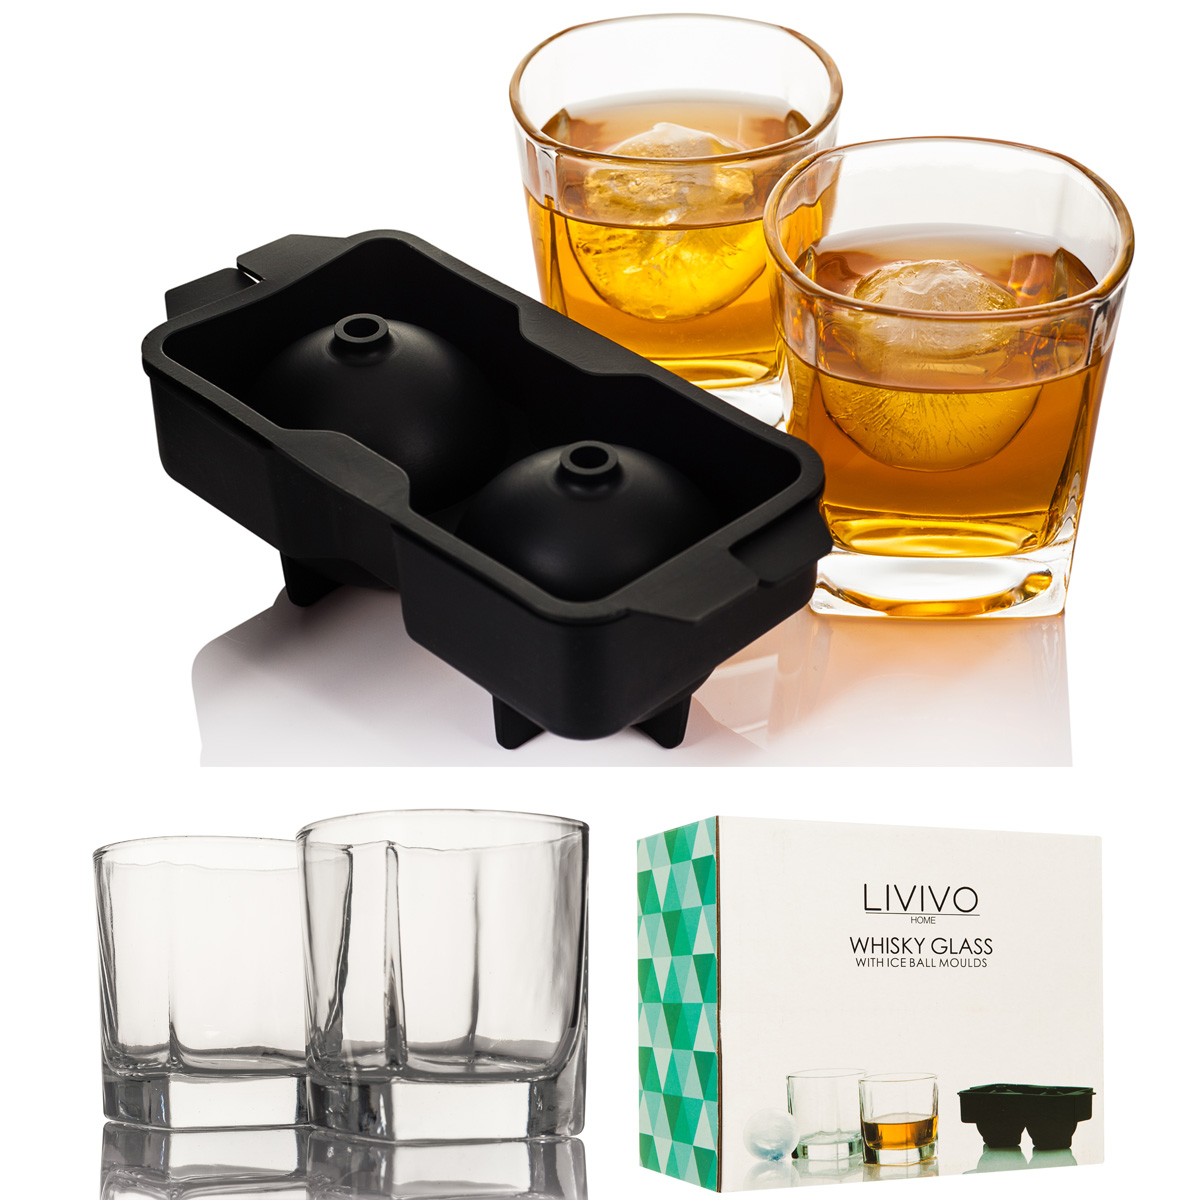 Livivo Milkshake Maker W Cup Smoothies Protein Shakes